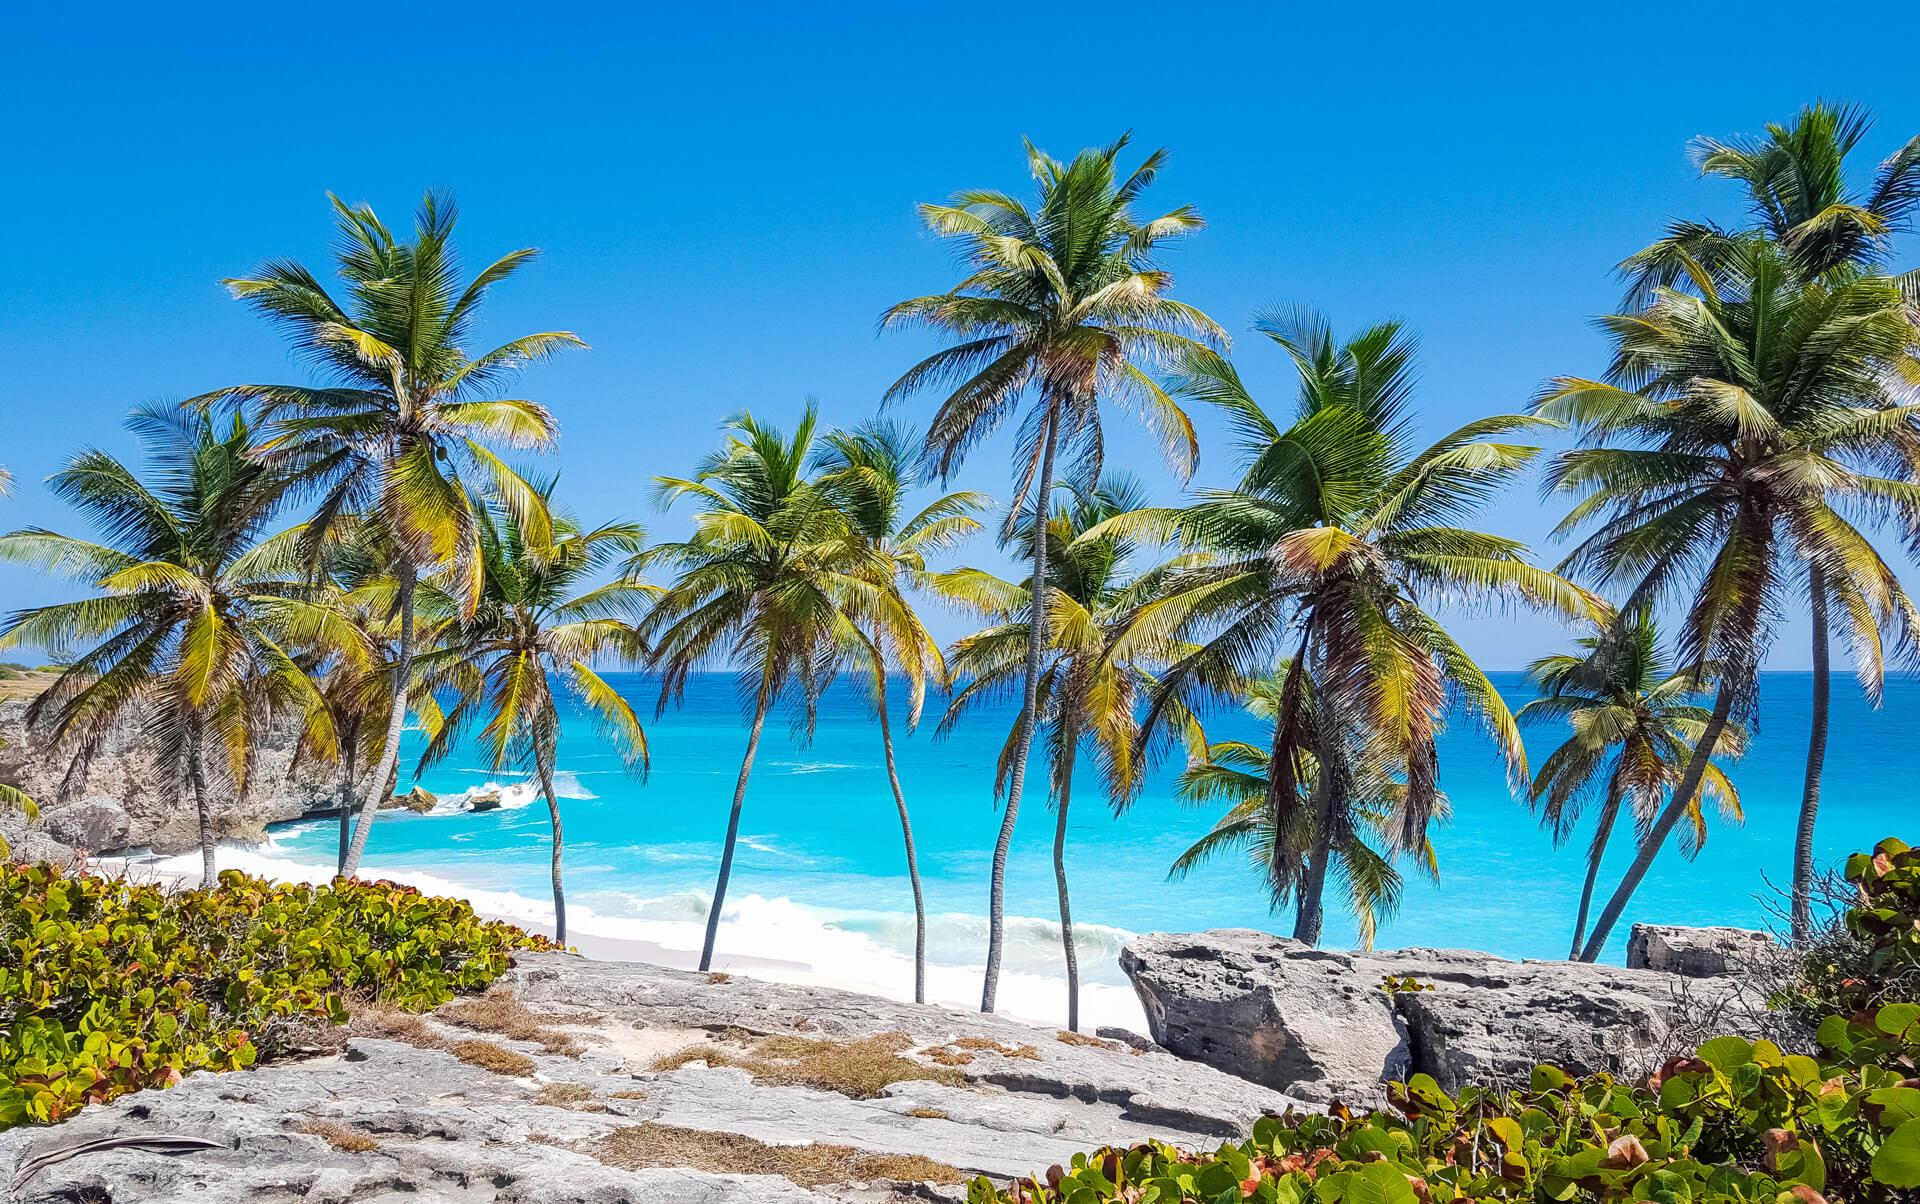 palmtrees-bottom-bay-beach-barbados